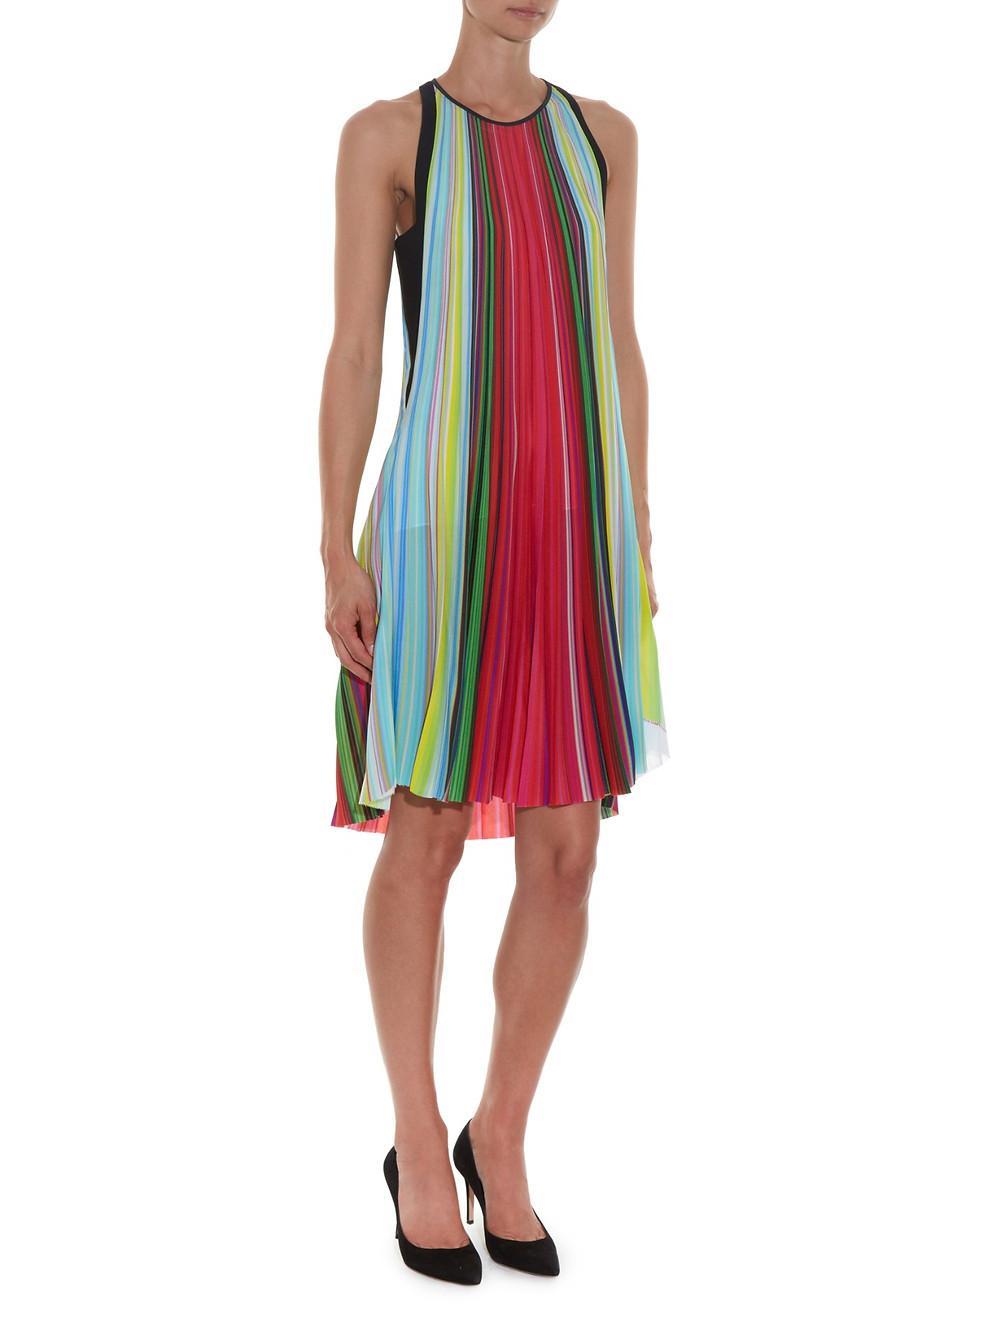 Mary Katrantzou rainbow stripe dress $1,450